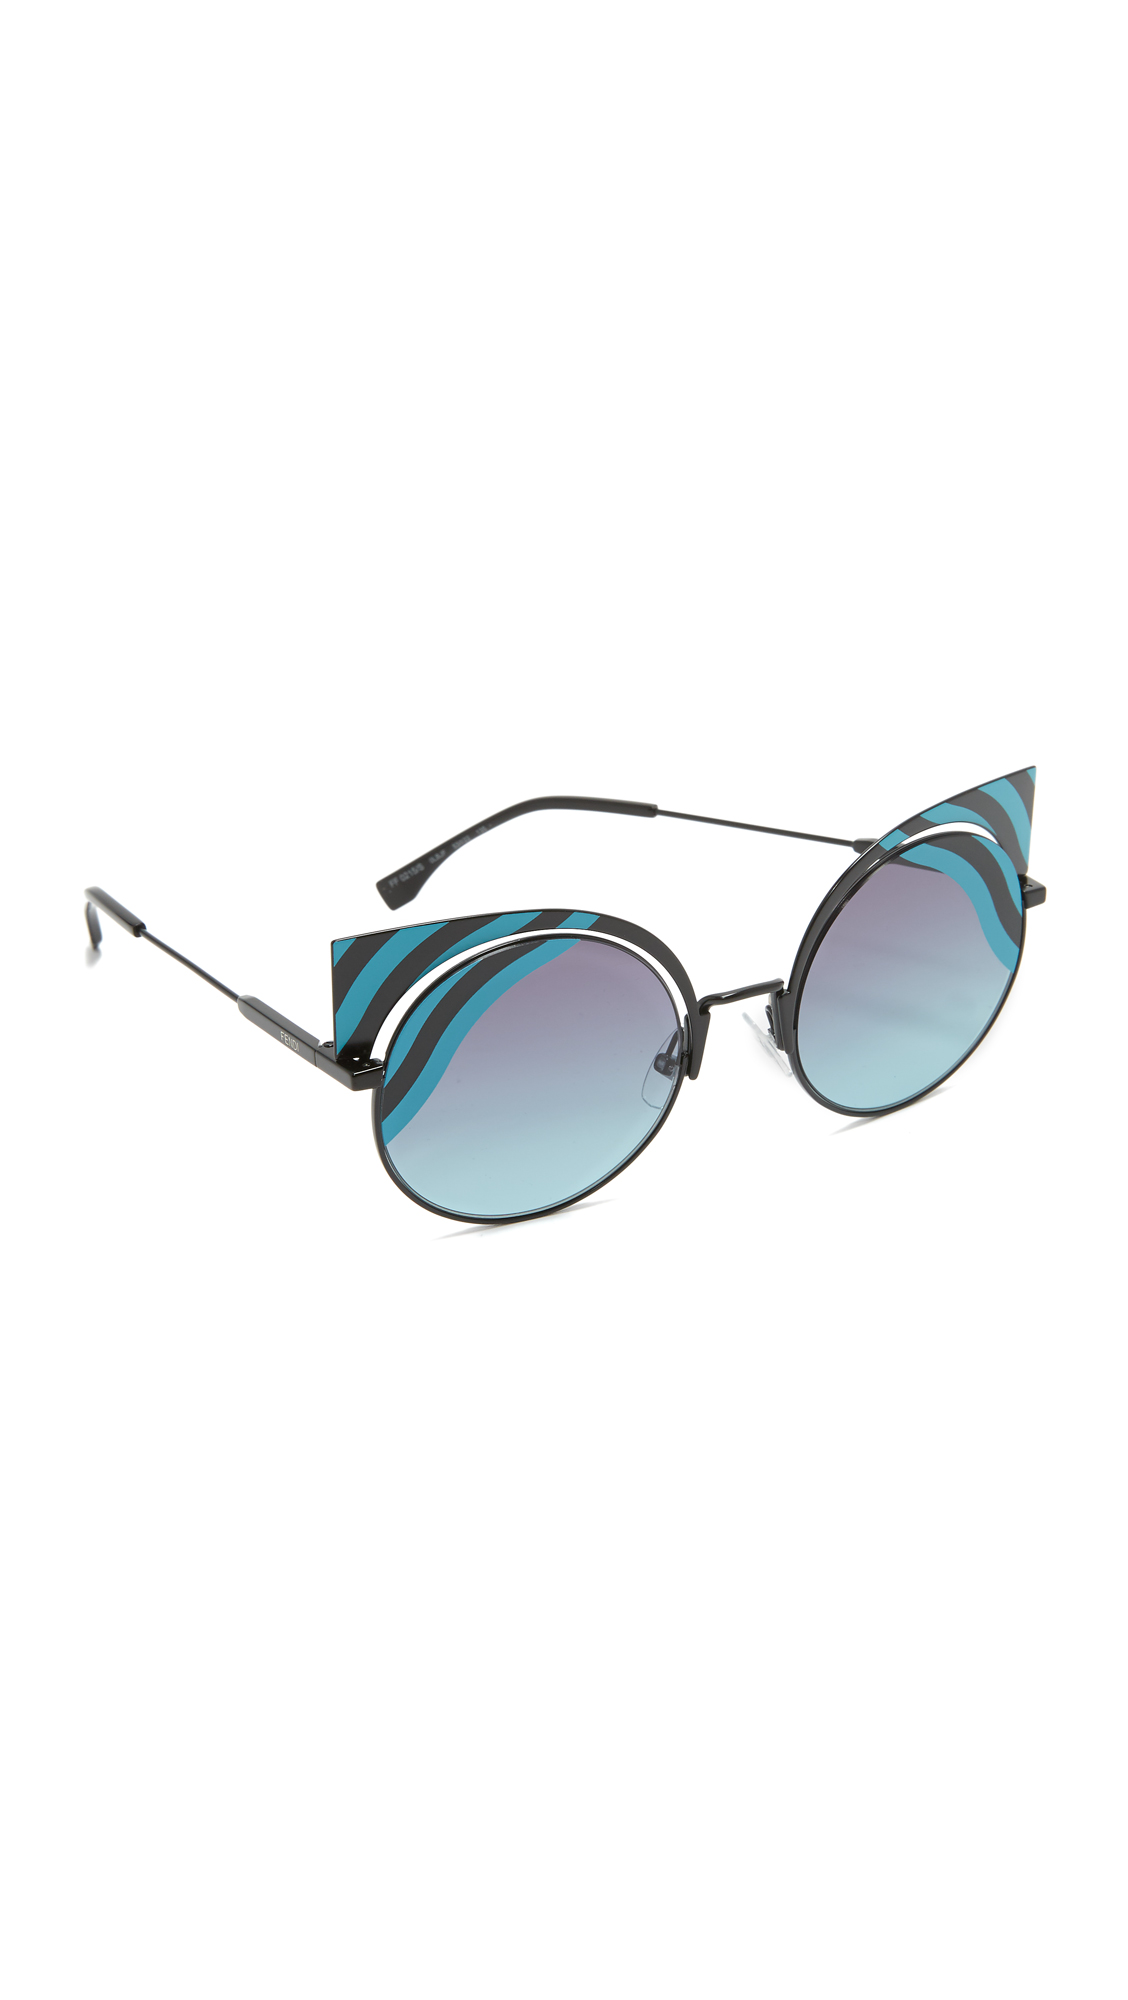 Fendi Hyposhine Sunglasses - Turquoise/Blue Aqua at Shopbop